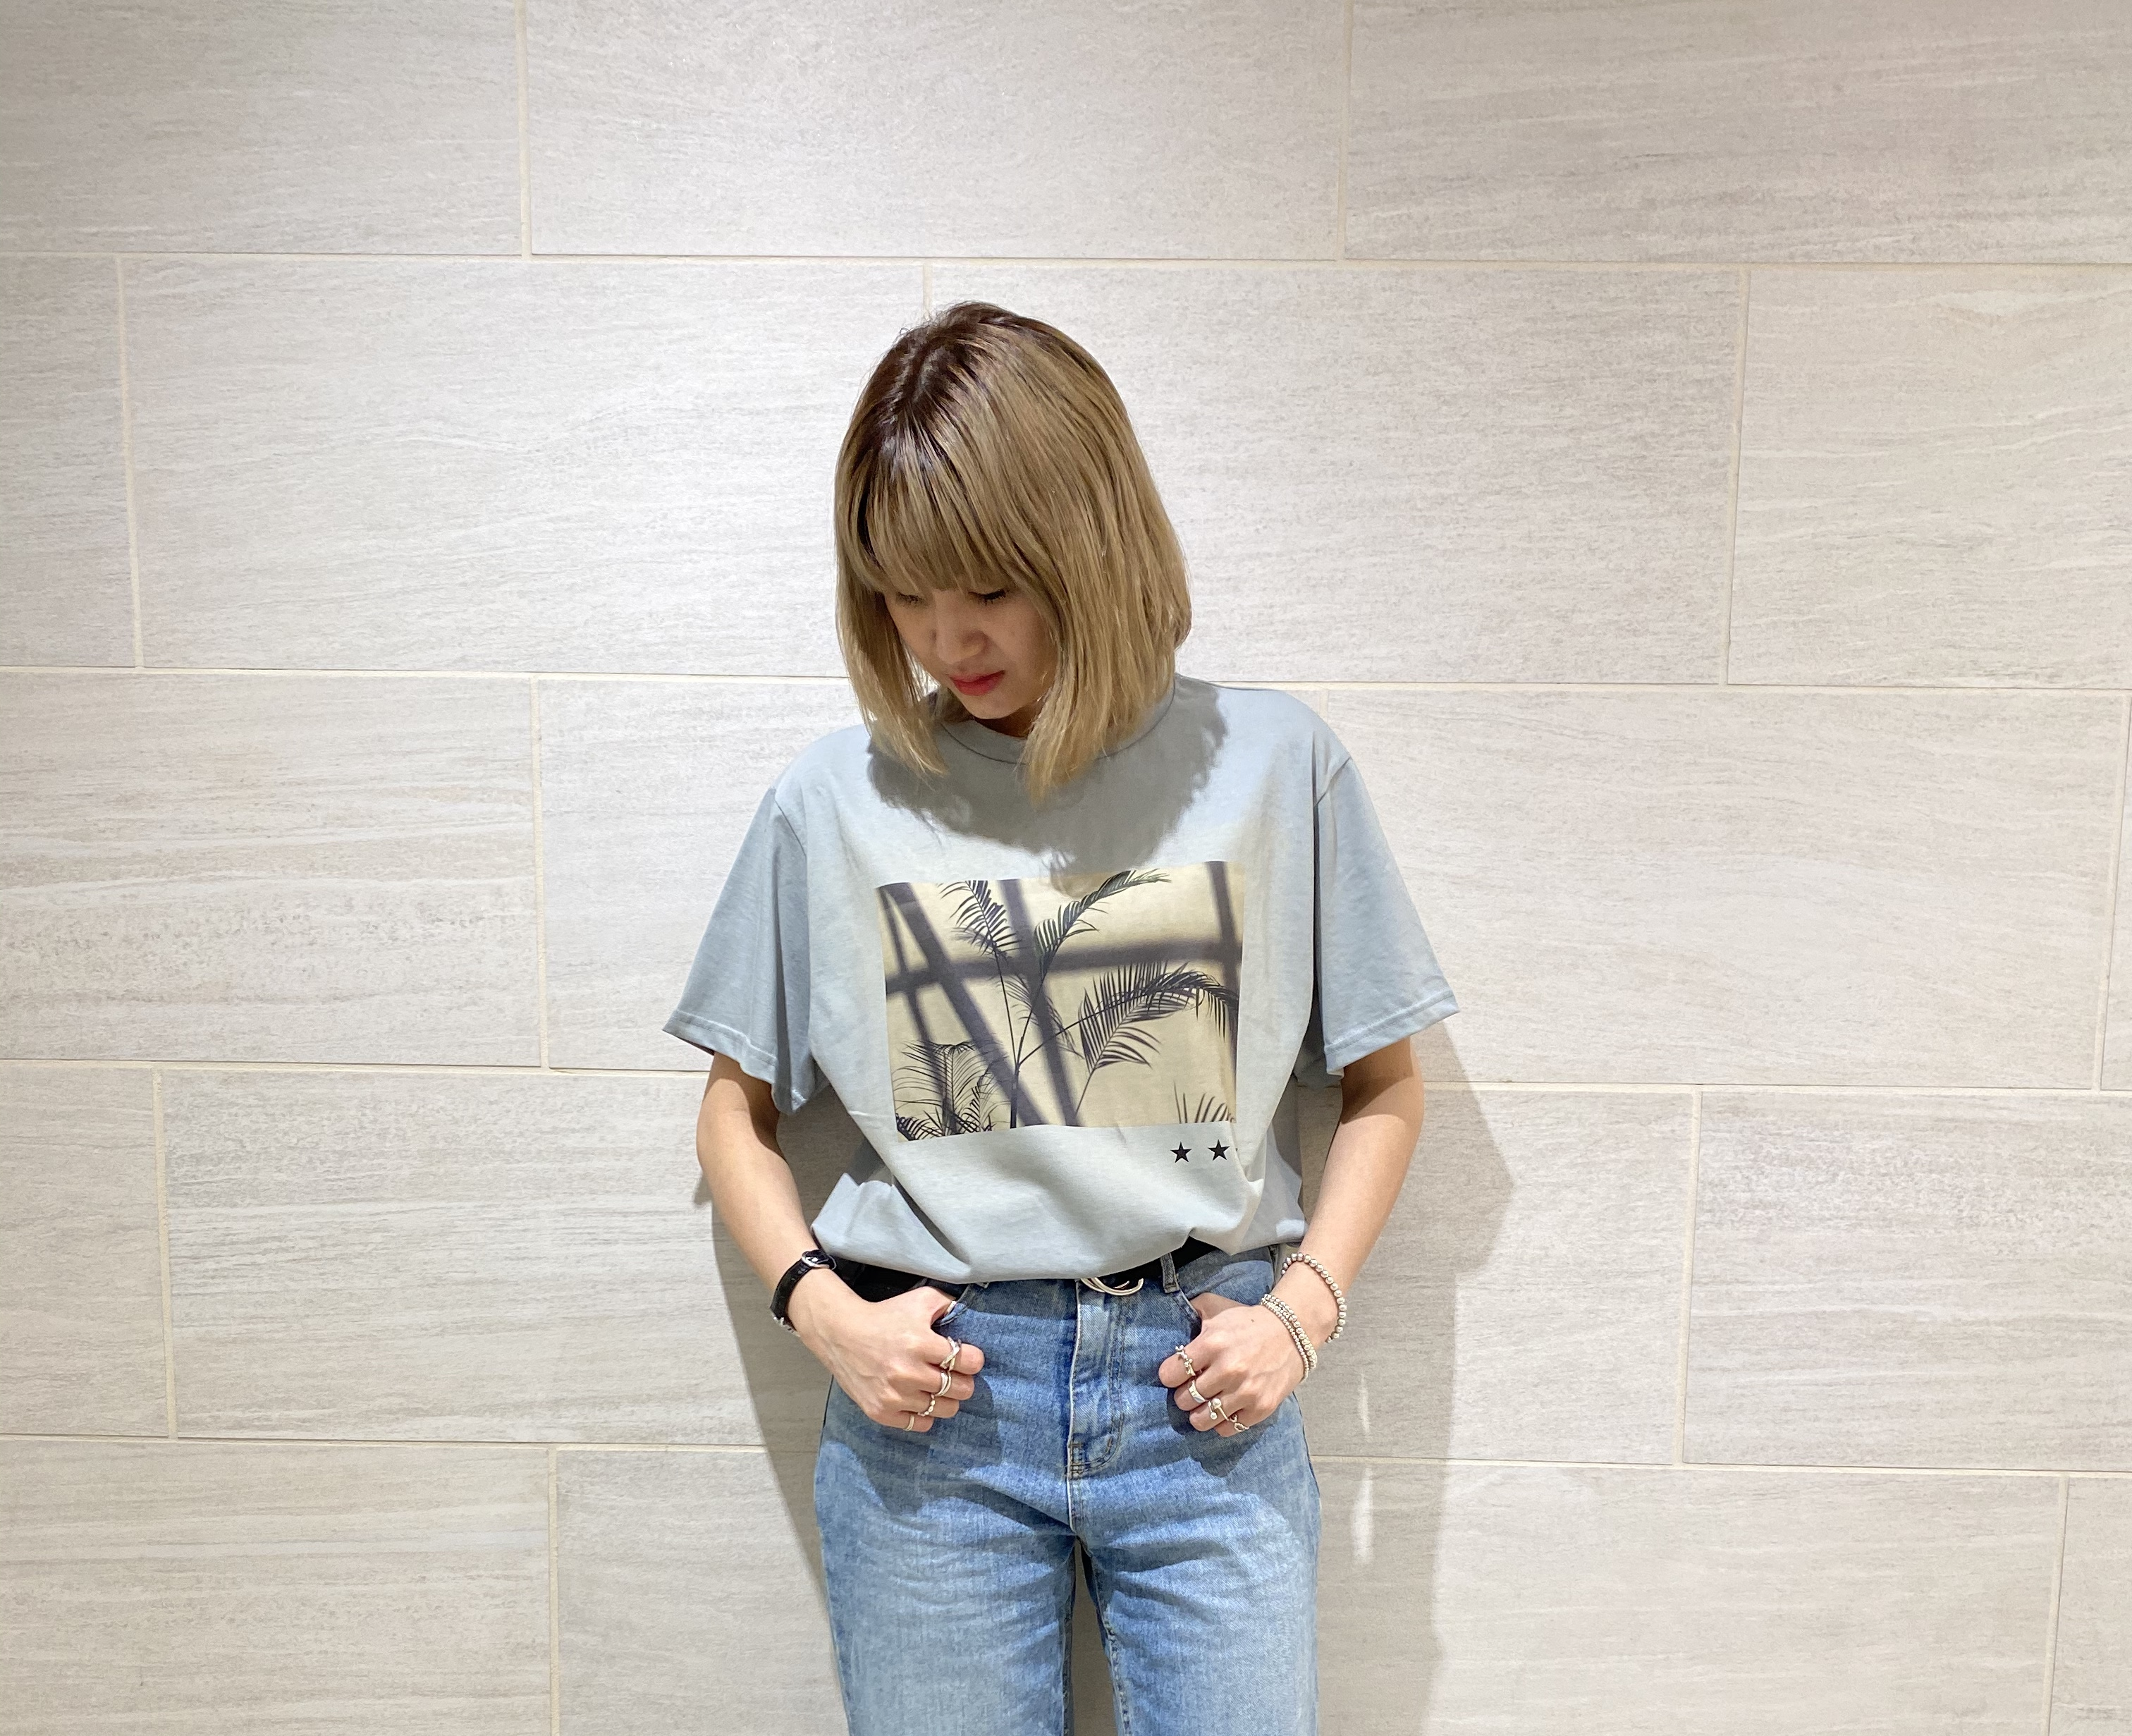 atnek by scrap book スクラップブック t-shirt tシャツ 半袖 ティーシャツ 夏 プリントTシャツ フォトT